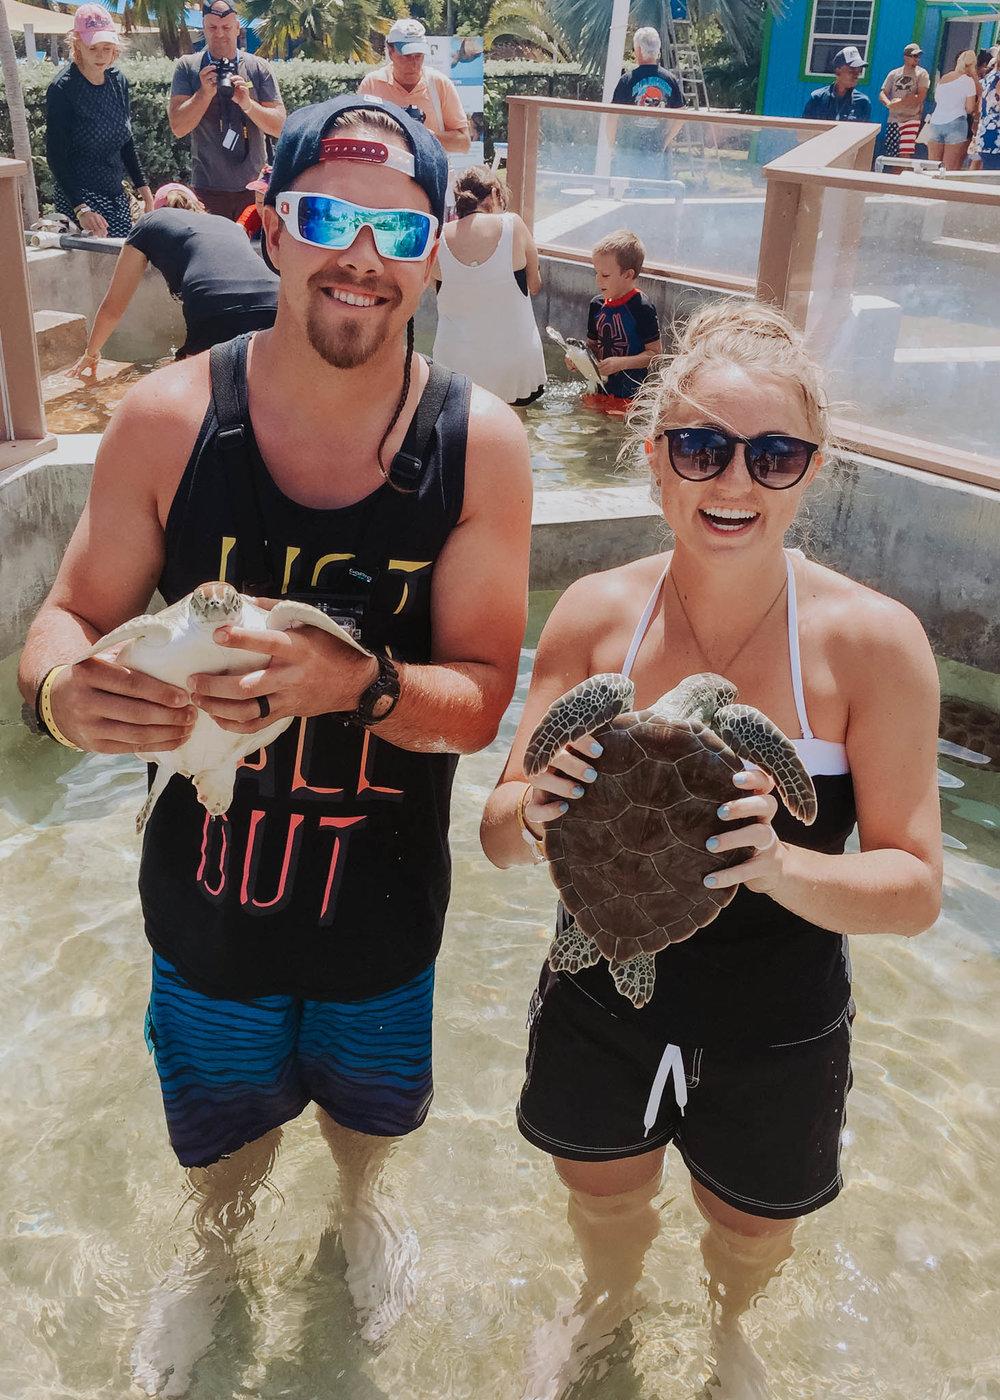 Travel Lifestyle   Travel Ideas   Inspiration   Travel Photography   Beach   Bucket List   Sledding   Dellany Elizabeth   Cayman Islands  Turtle Cove   www.dellanyelizabeth.com